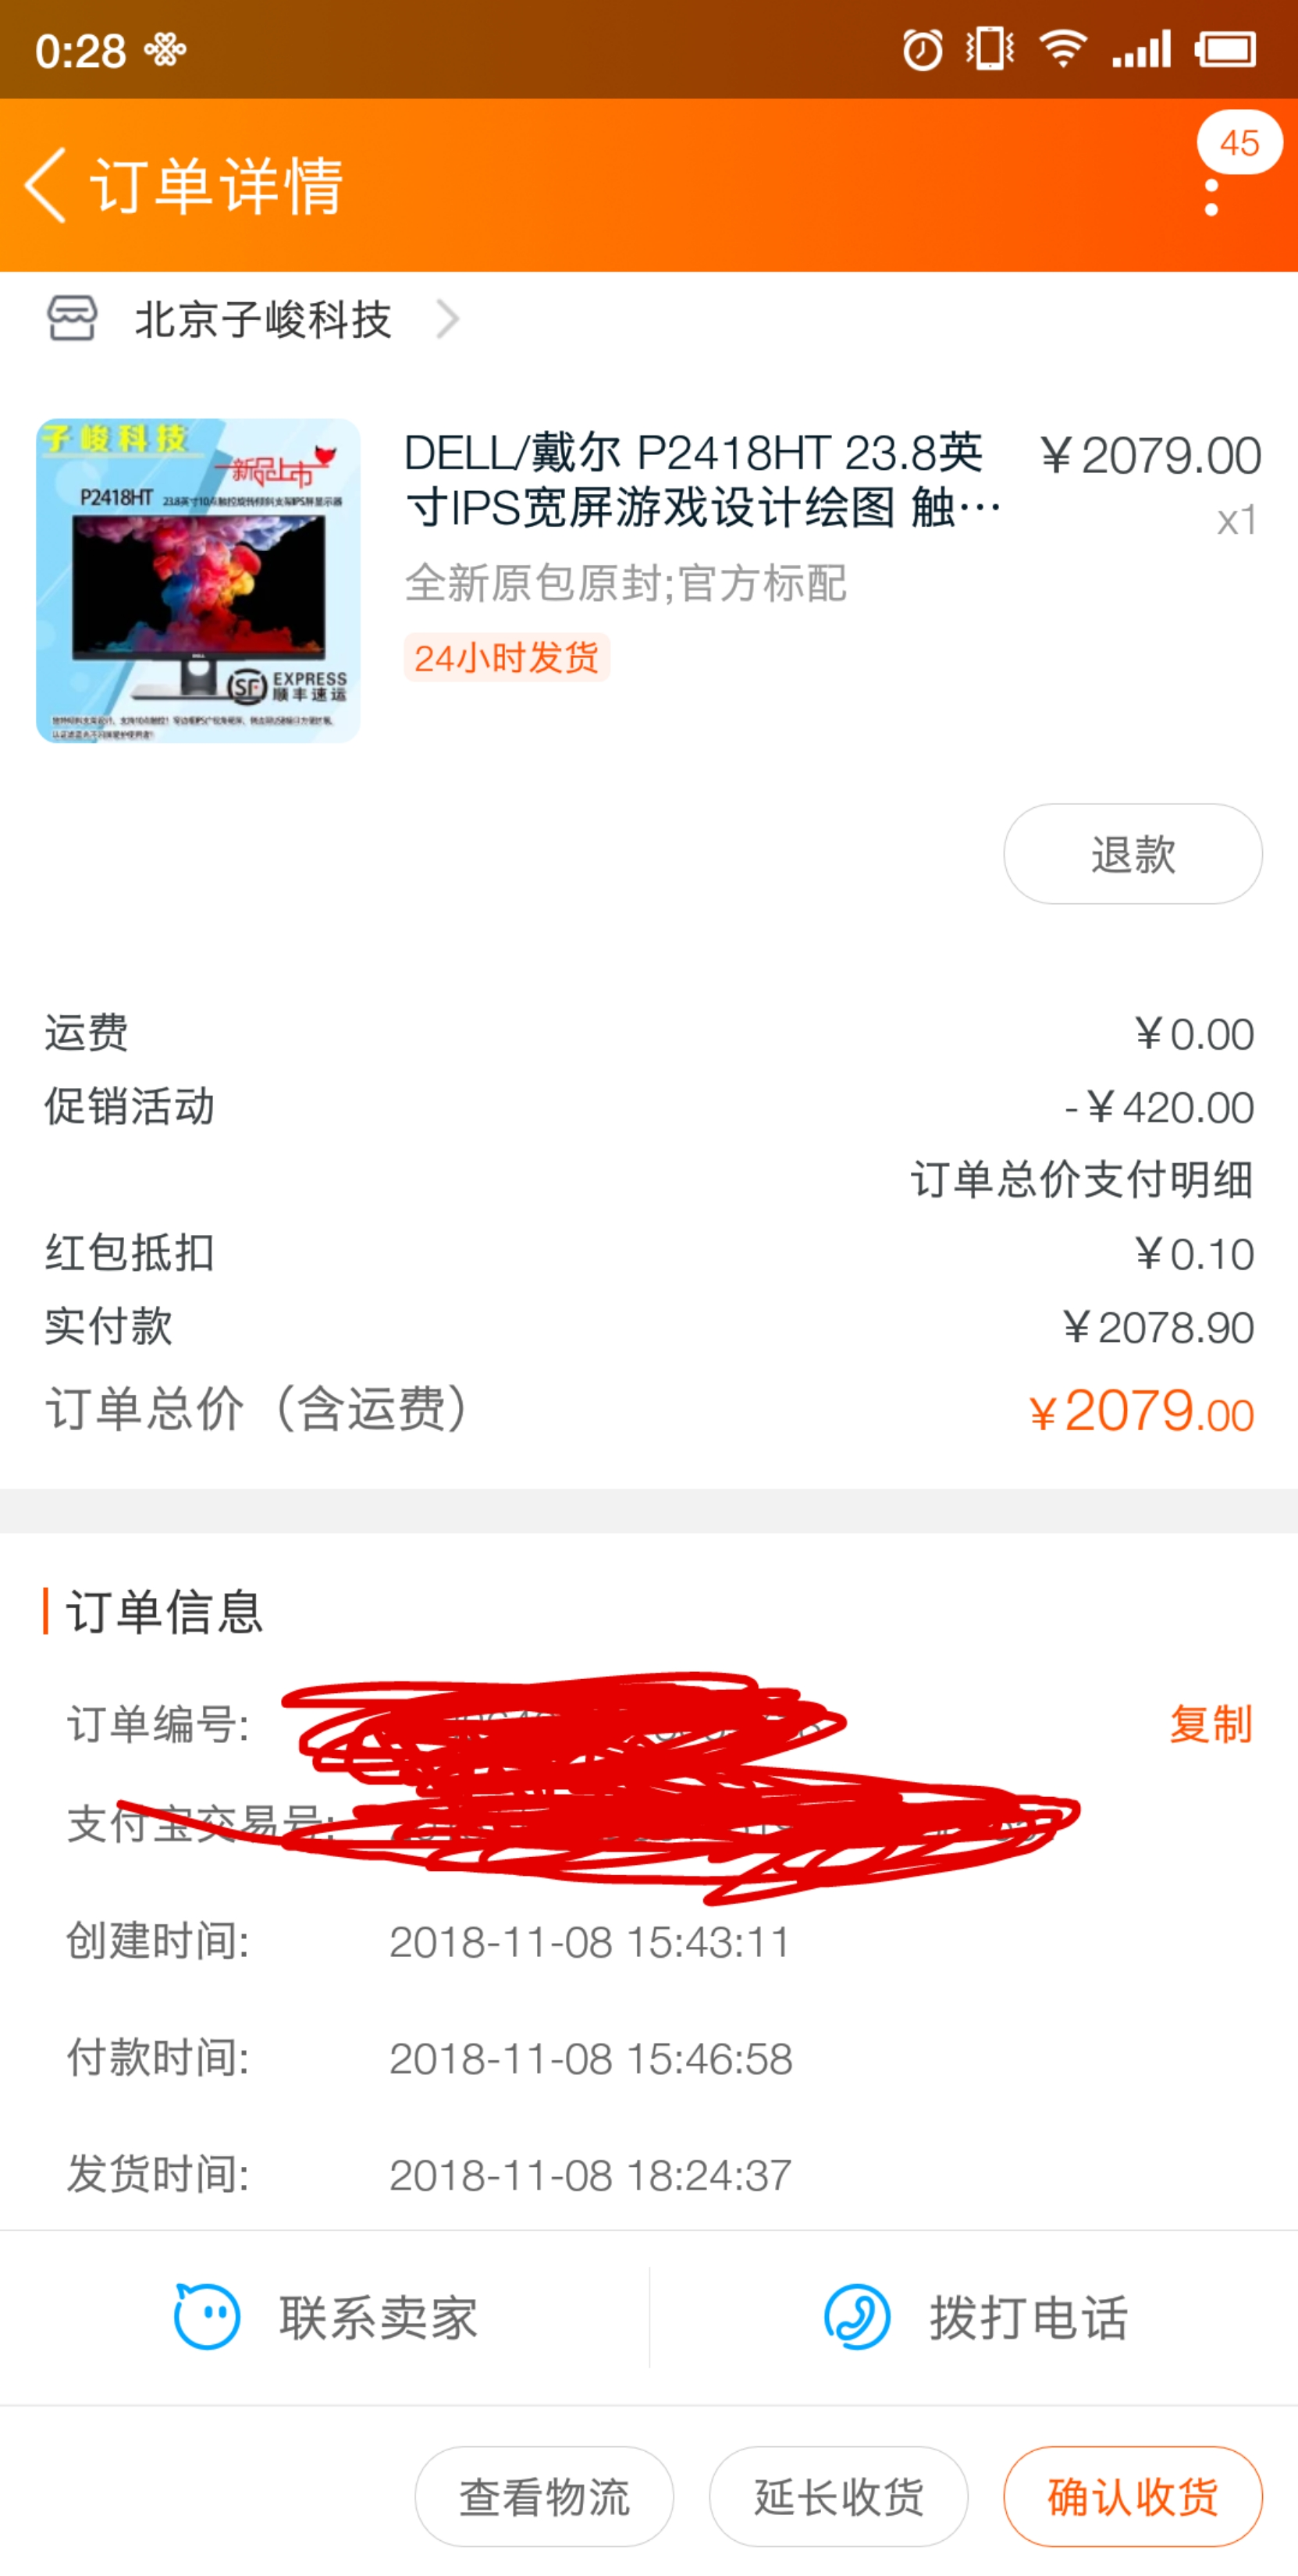 ??_Screenshot_2018-11-12-00-28-46-743_????.png